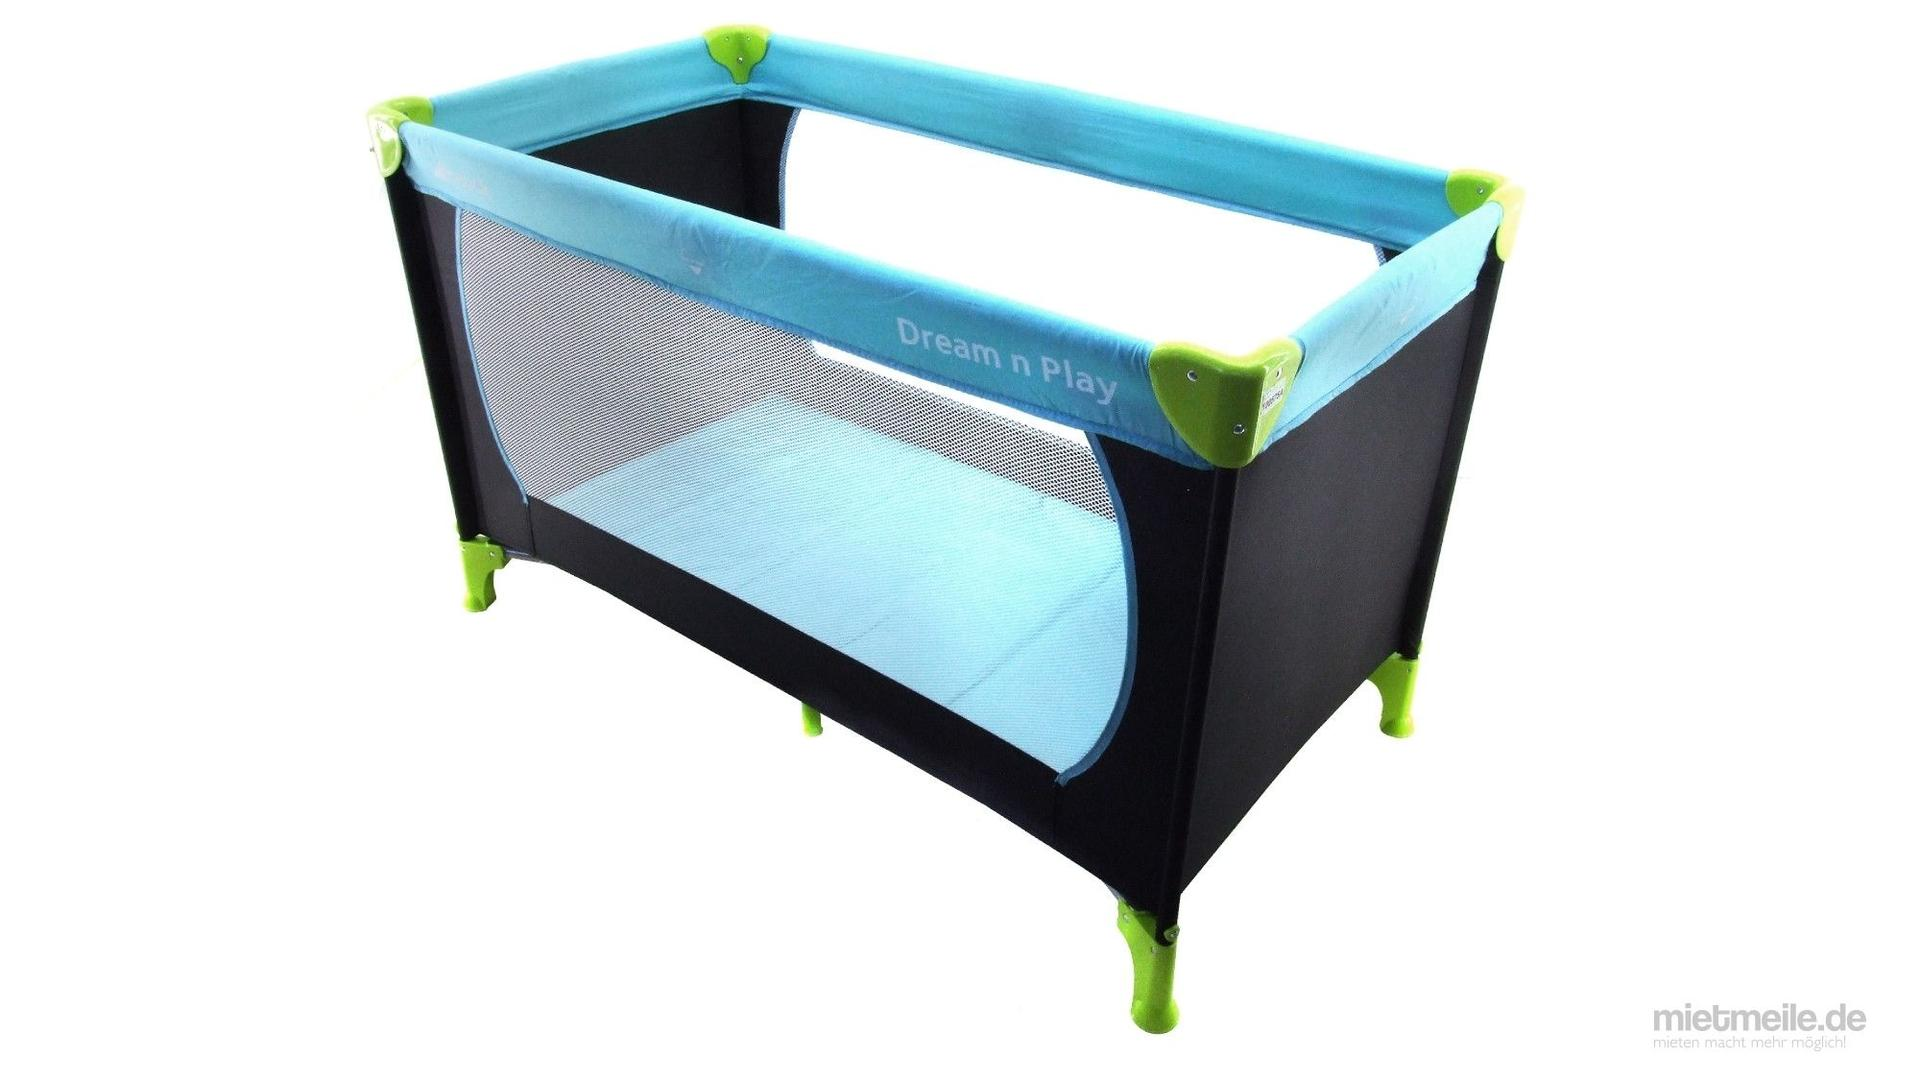 Kindermöbel mieten & vermieten - Reisebett Baby-Bett Kinder-Bett Faltbett in Schkeuditz